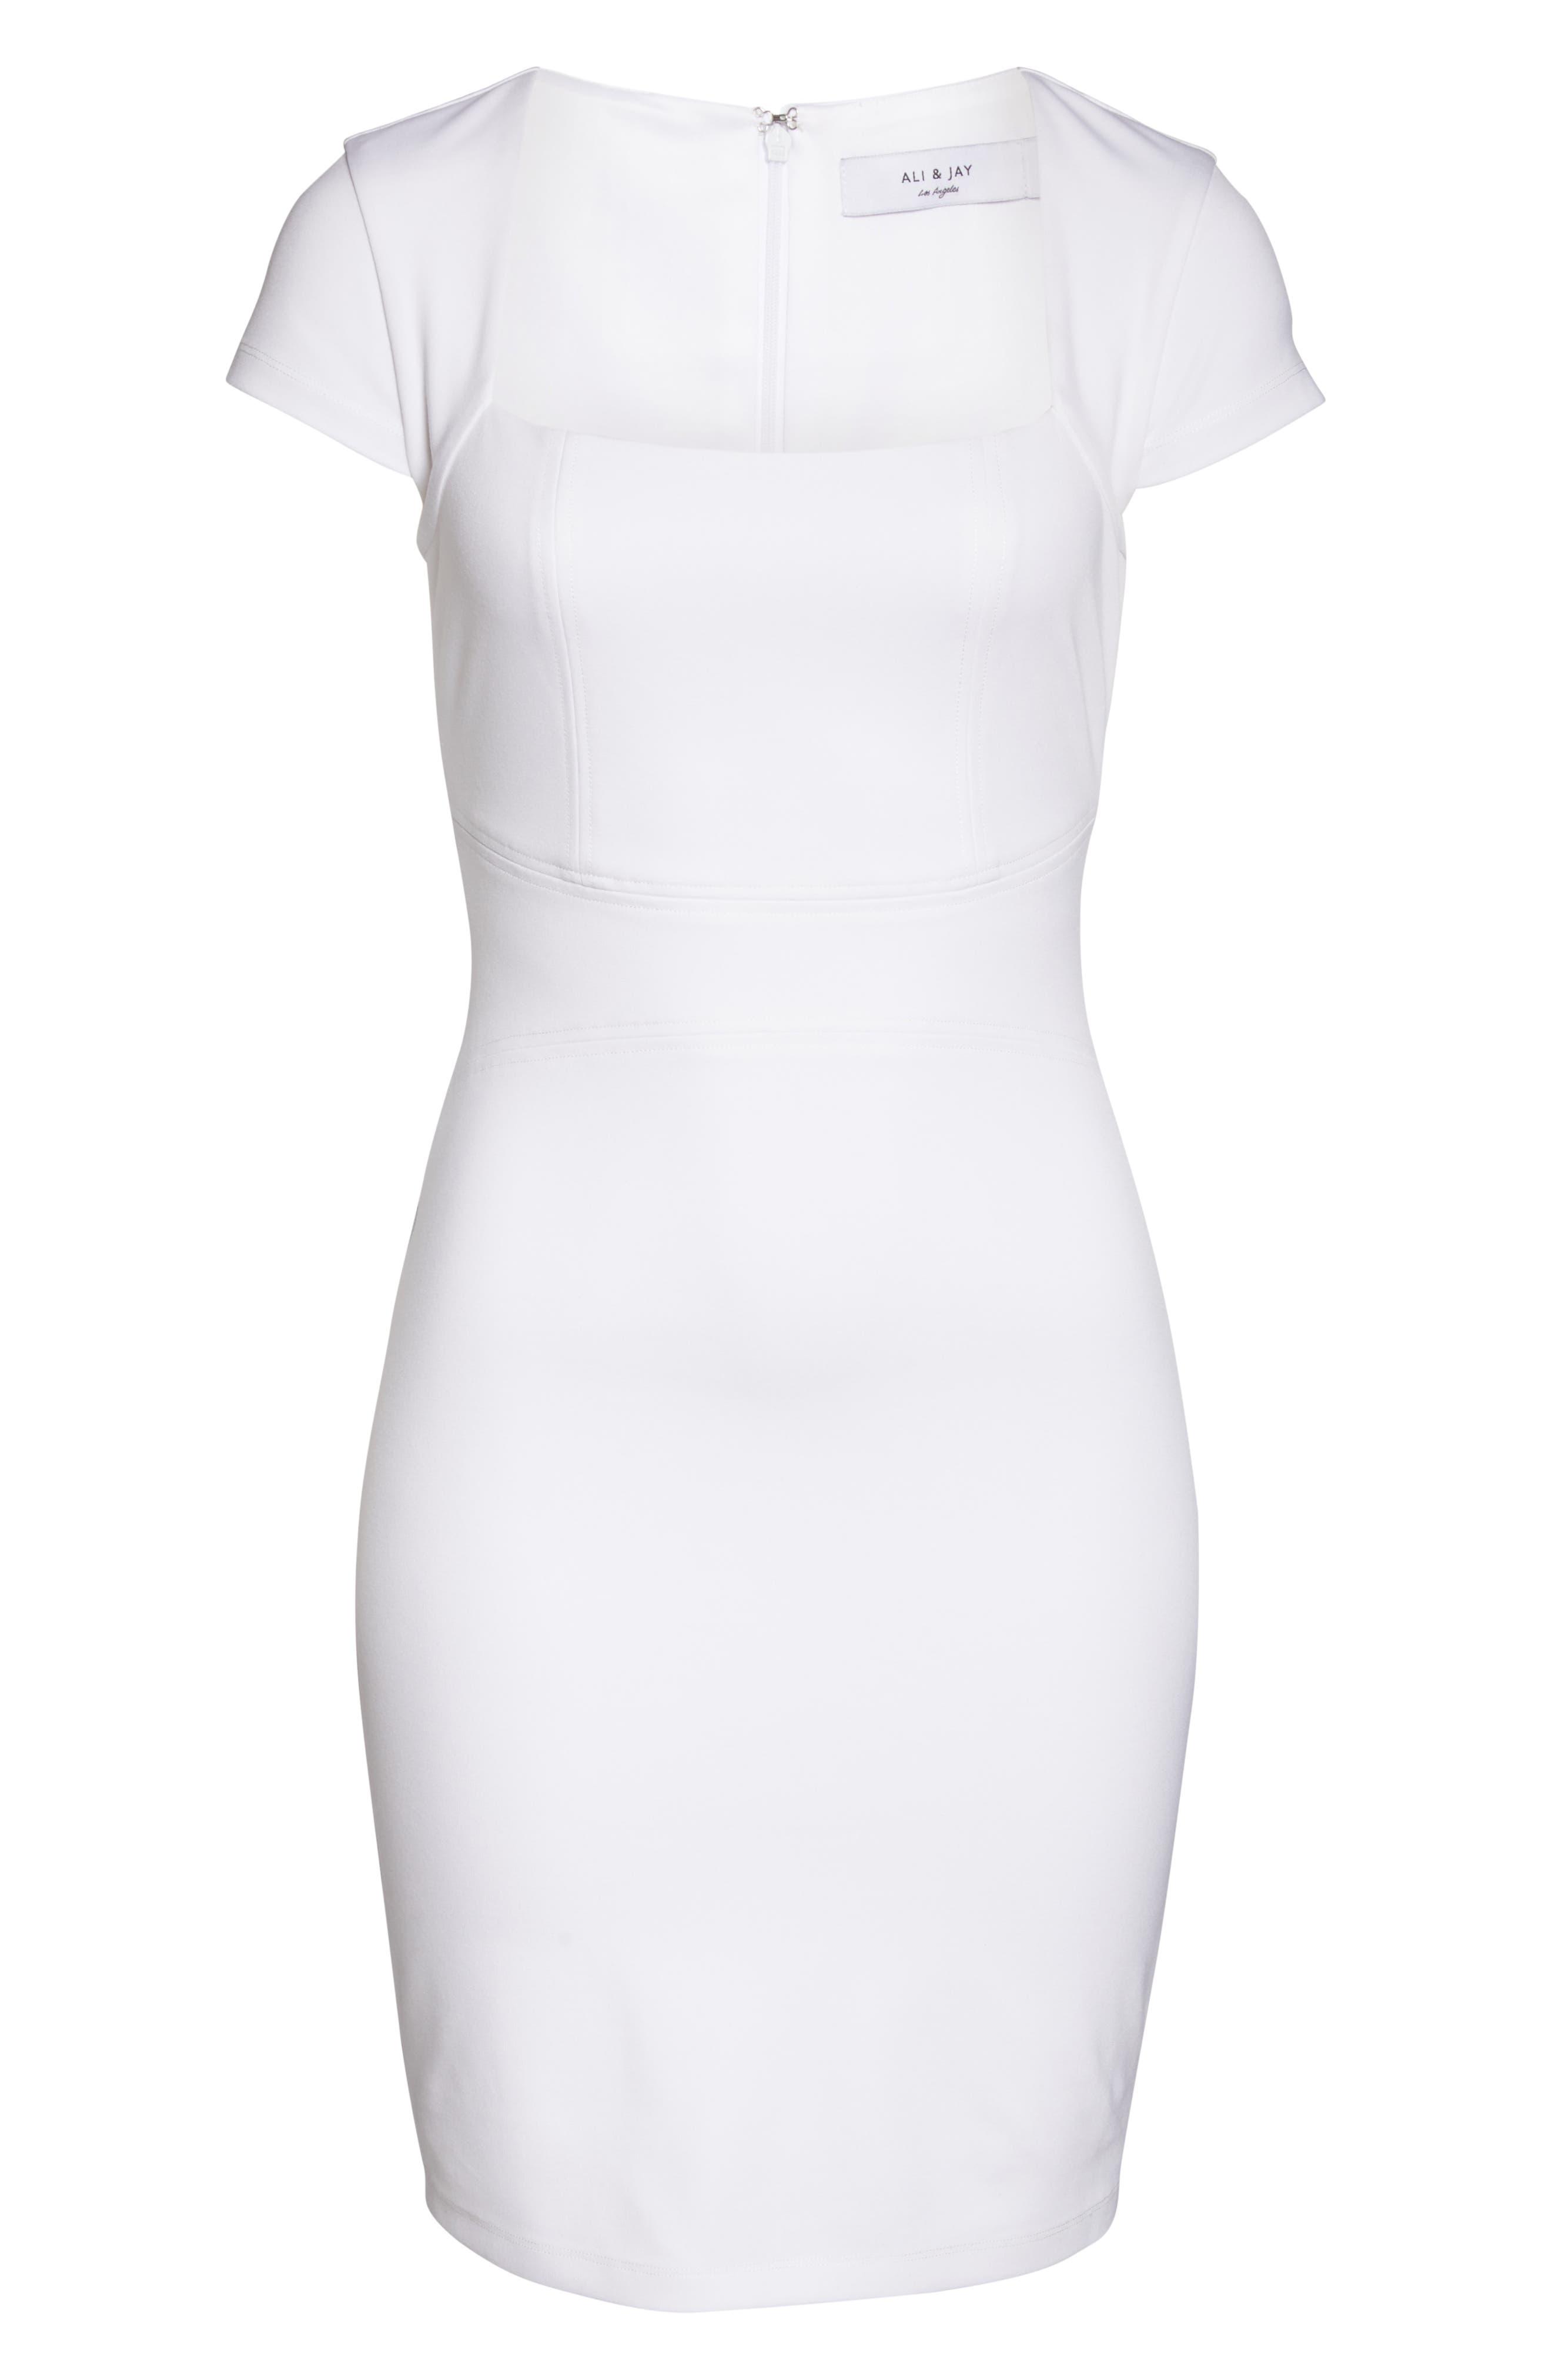 ALI & JAY, Olive Street Body-Con Dress, Alternate thumbnail 7, color, WHITE